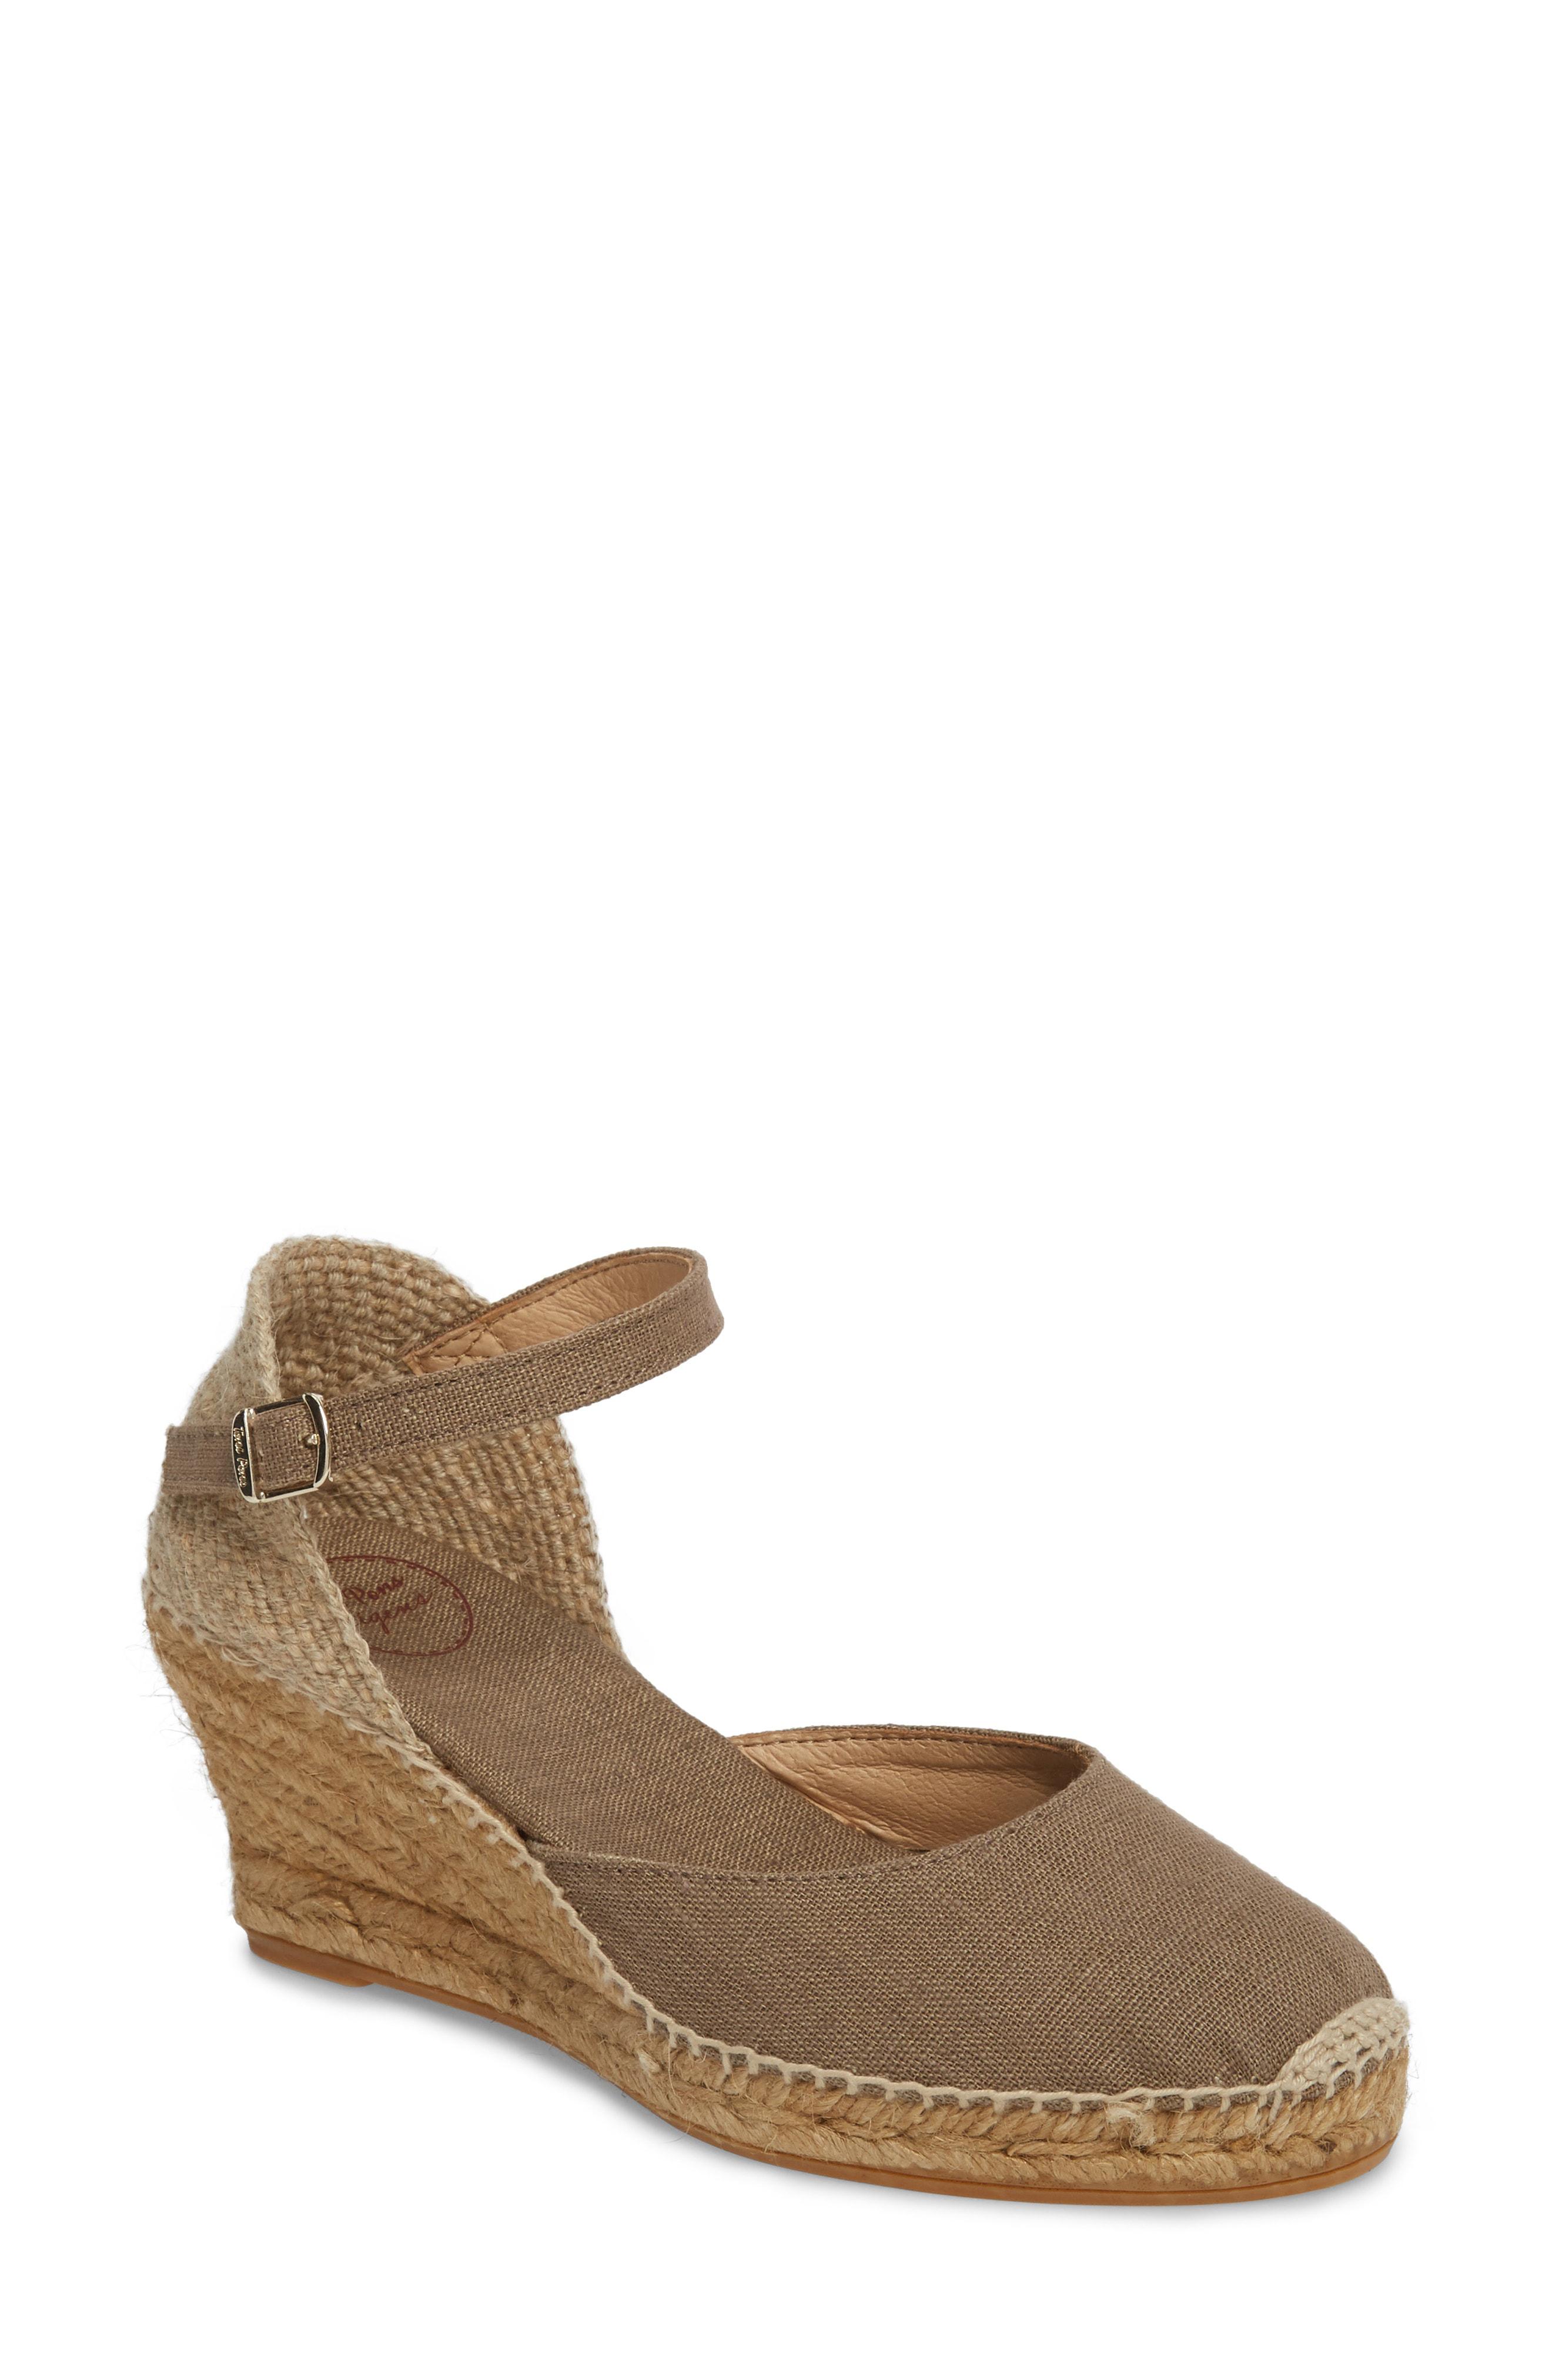 3d1b8ff3b63 'Caldes' Linen Wedge Sandal in Khaki Fabric